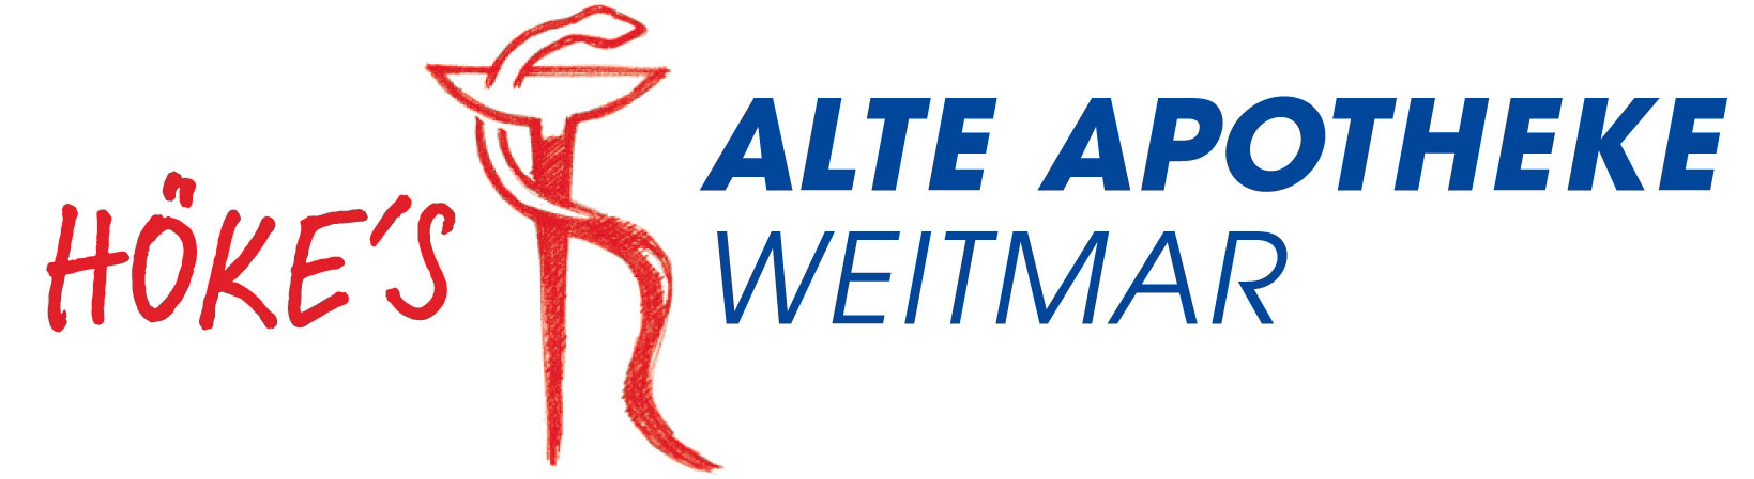 Logo der Hökes Alte Apotheke Weitmar